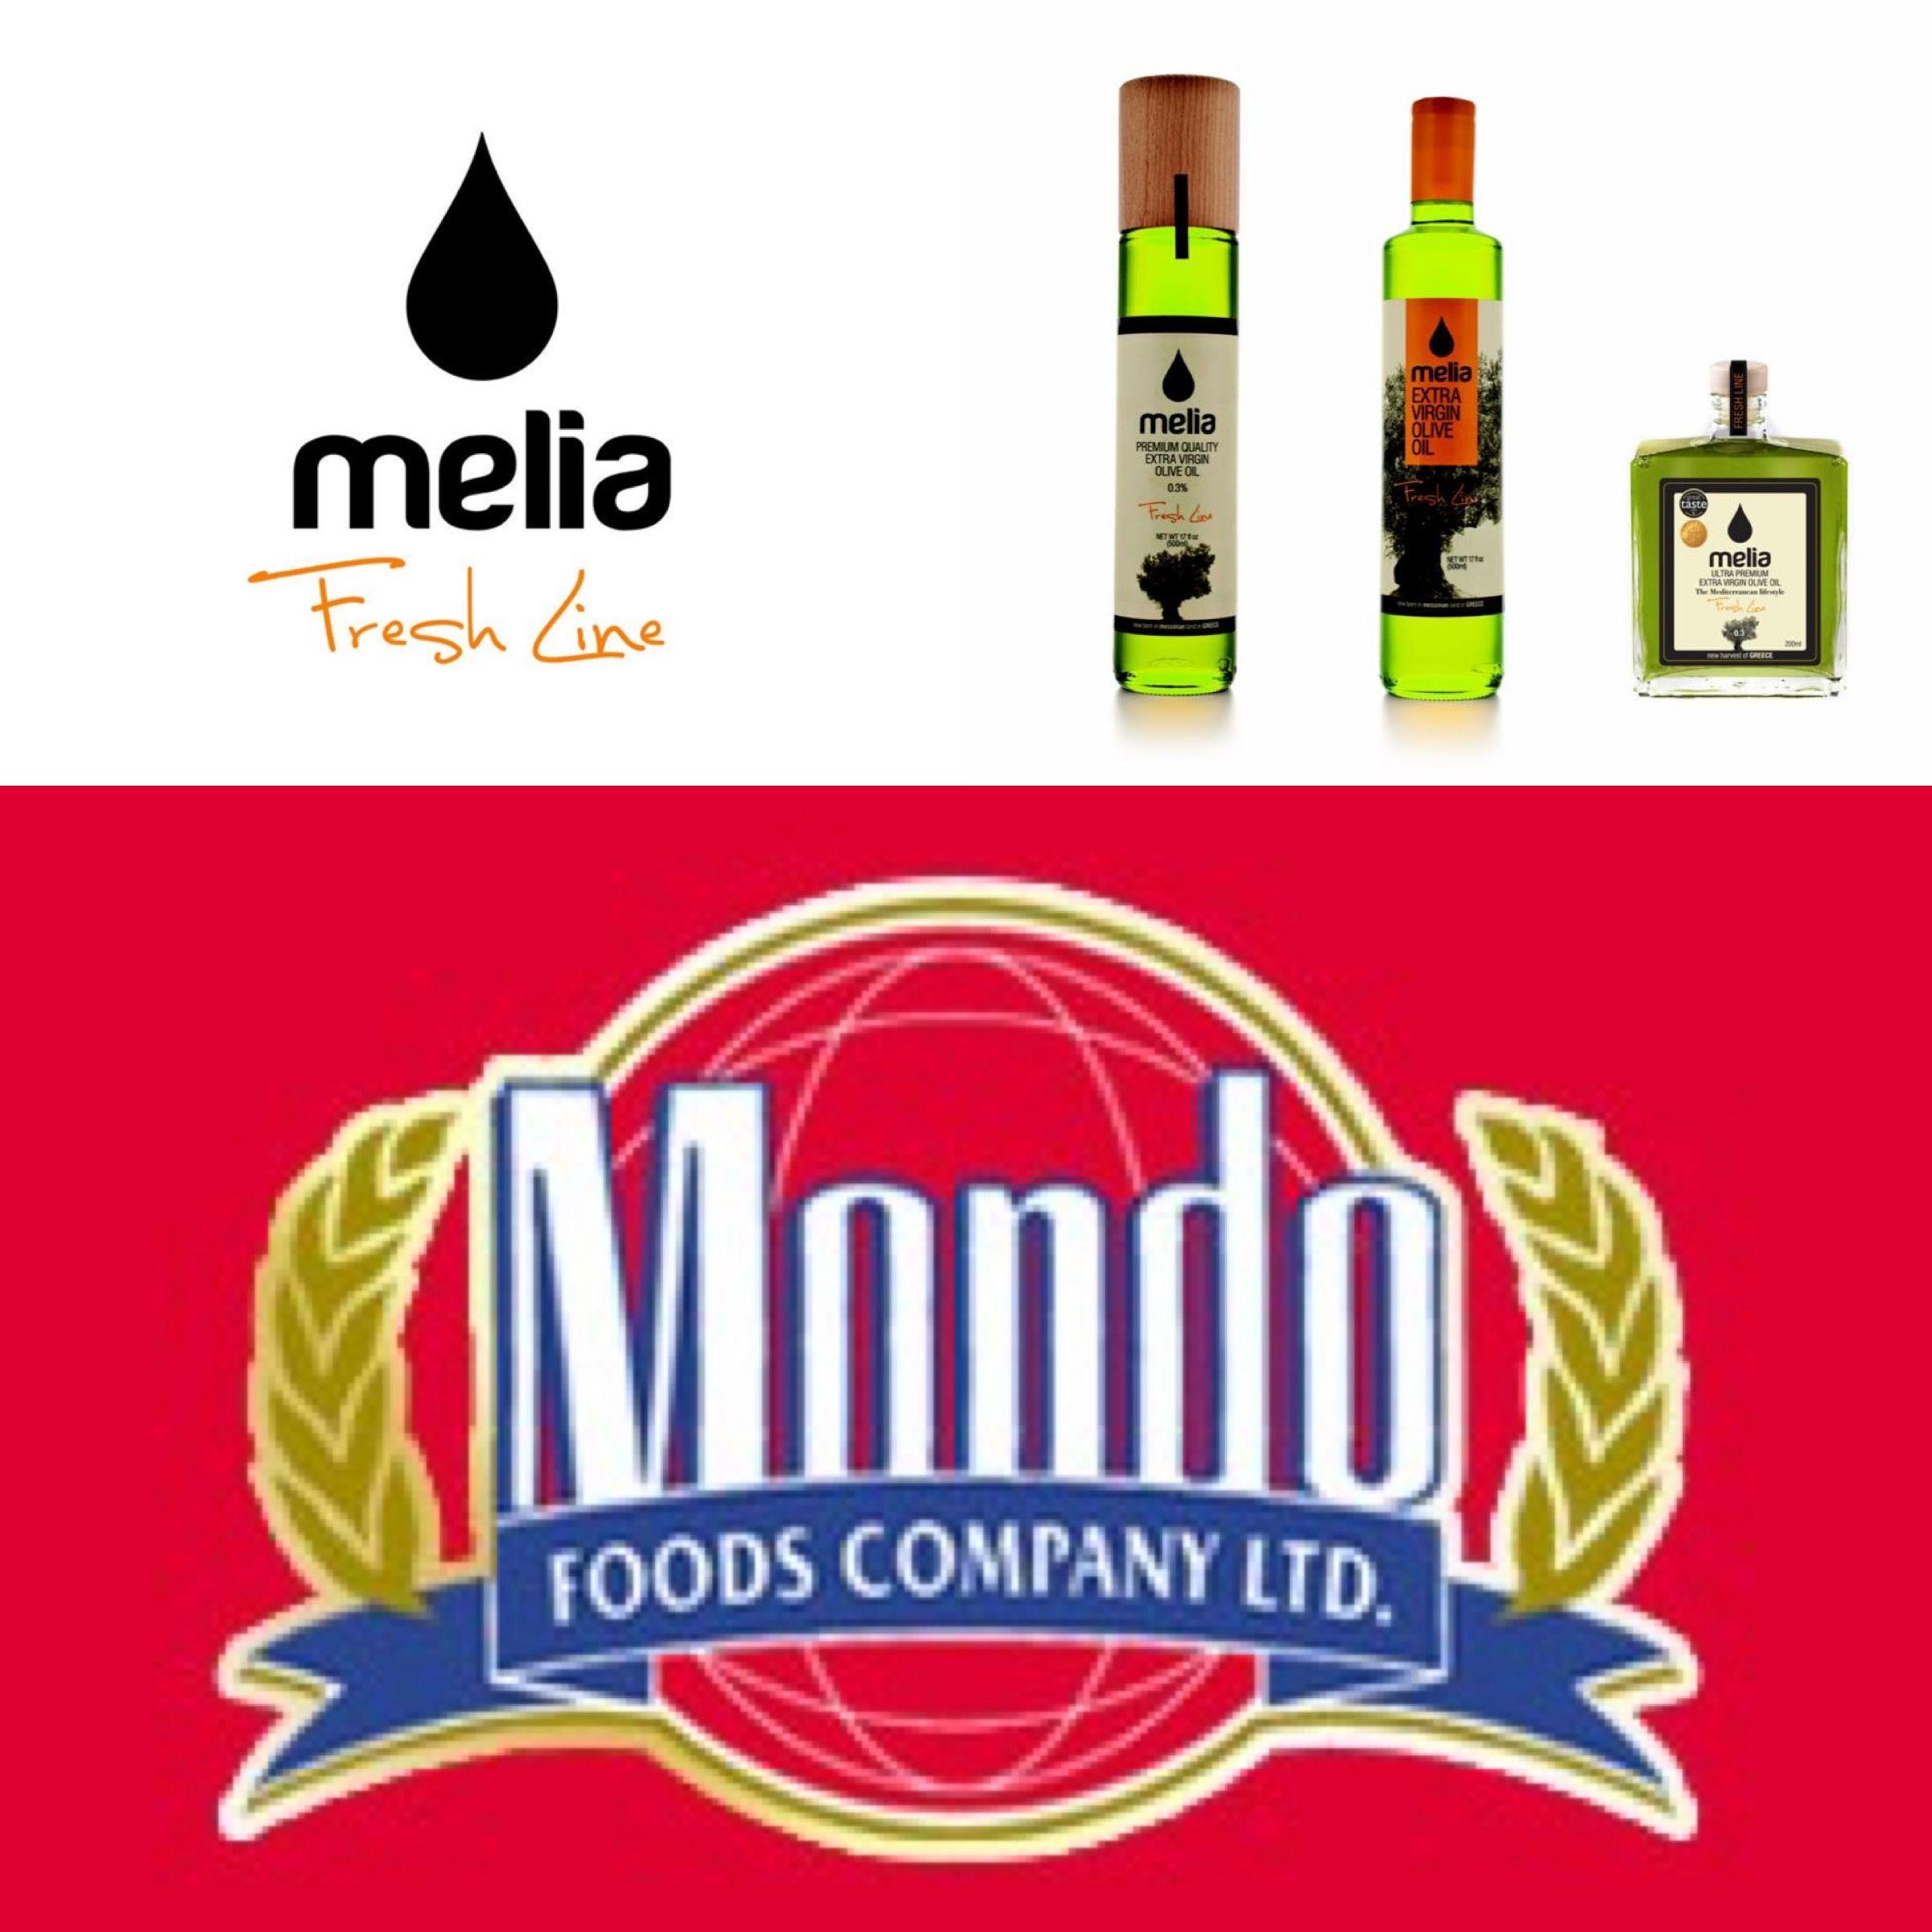 Mondo Foods Company Ltd  is a broadline Importer and Distributor of